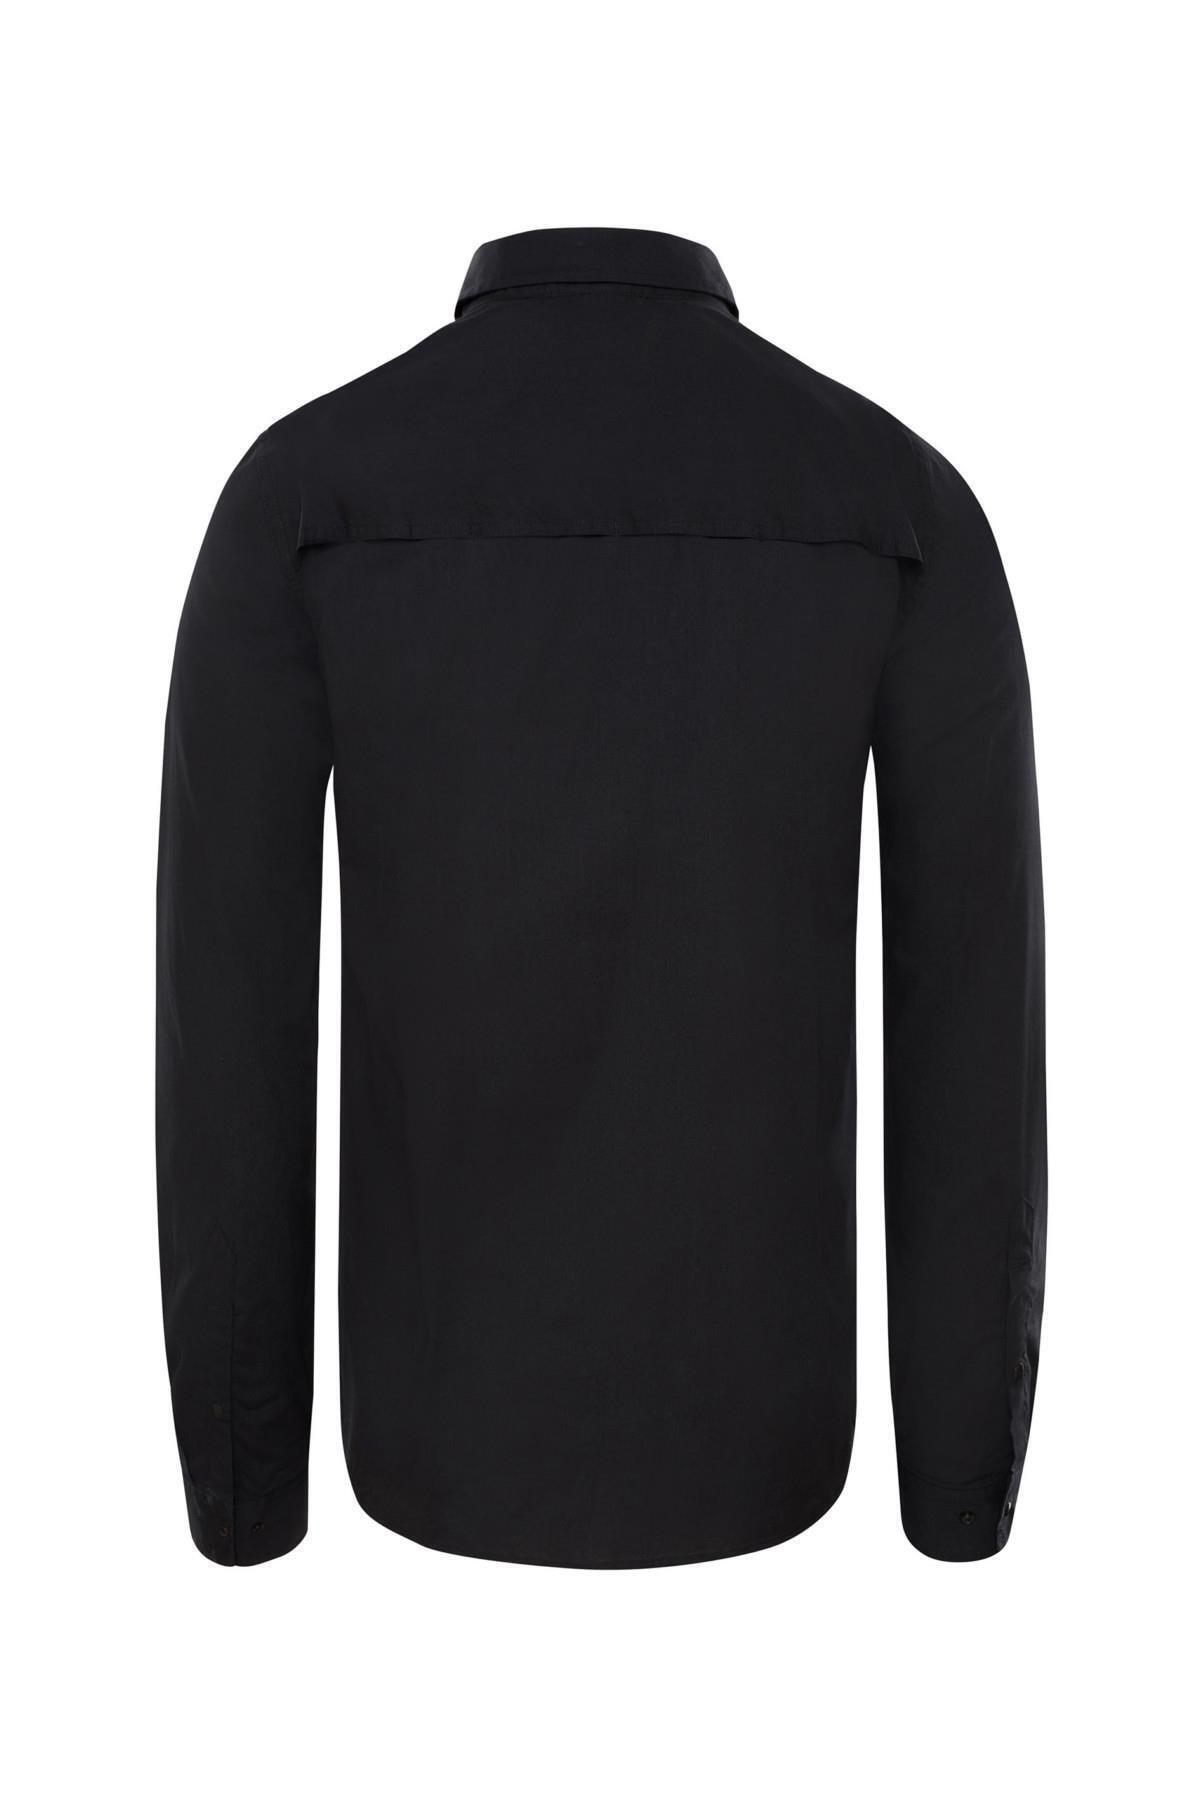 THE NORTH FACE Watkıns Erkek Gömlek Siyah 2